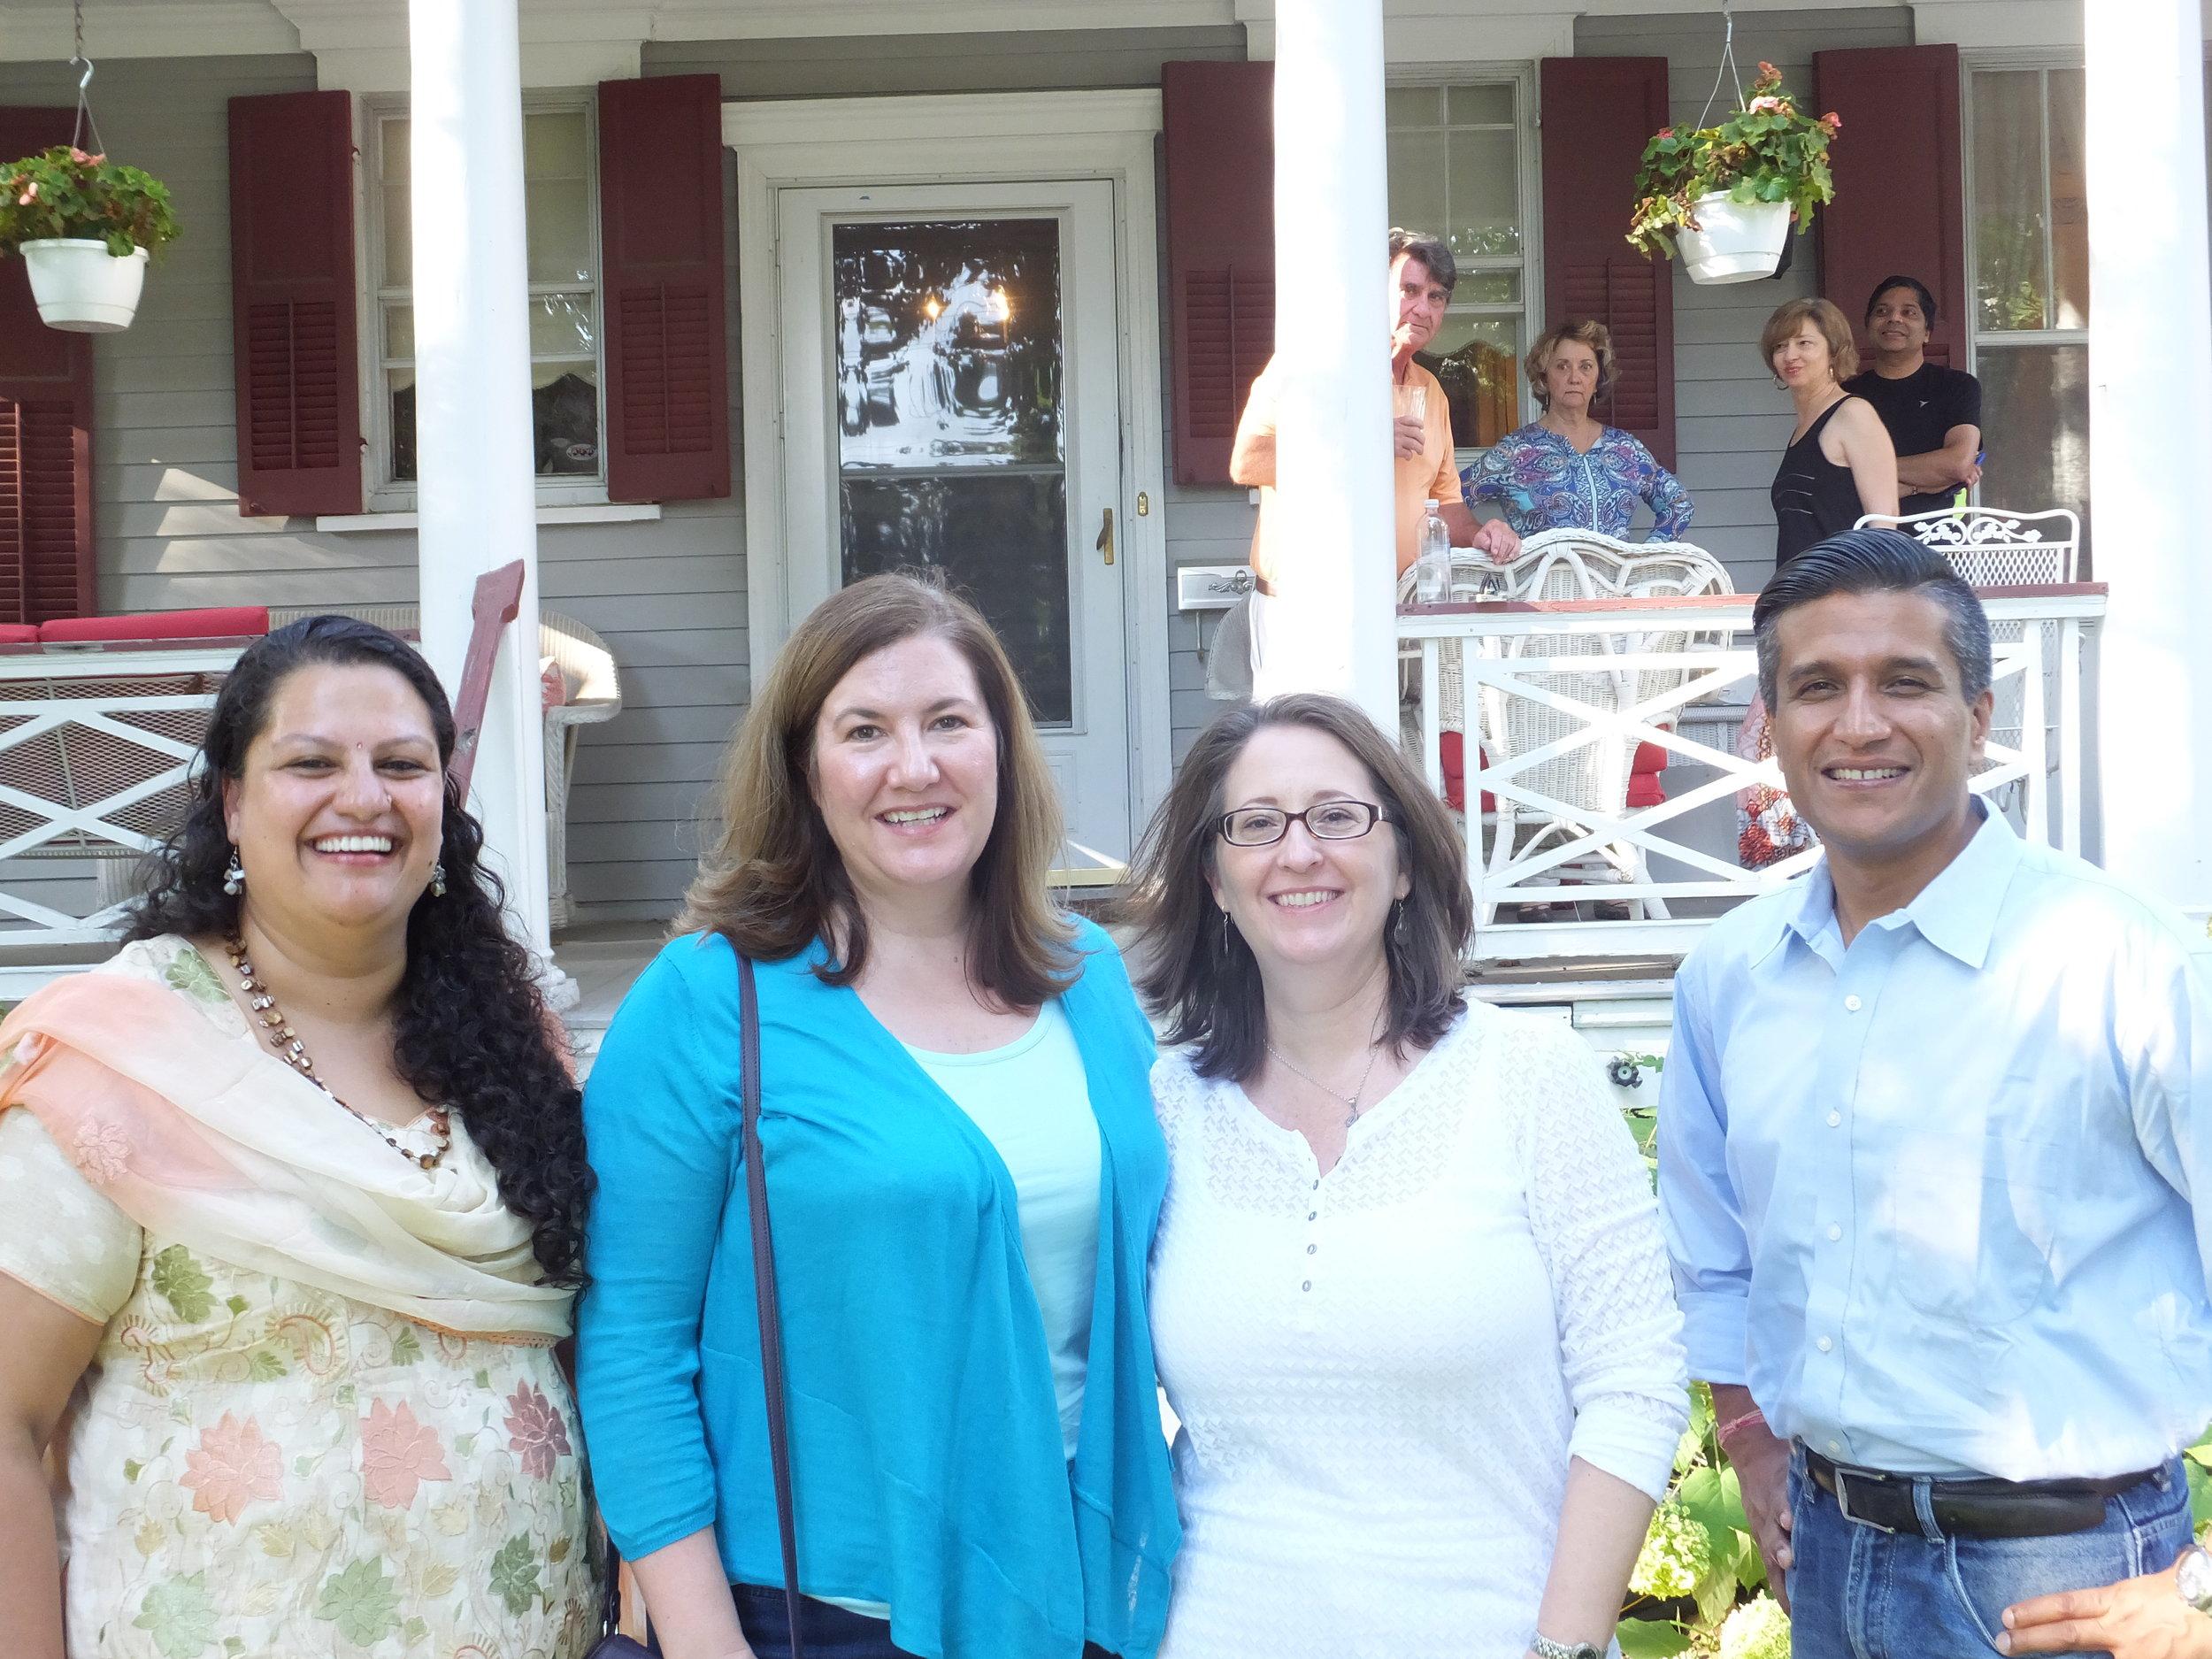 Leena, Director in Nepal, and Yogesh, NGO board president, meet with sponsors in Saint Louis Missouri.